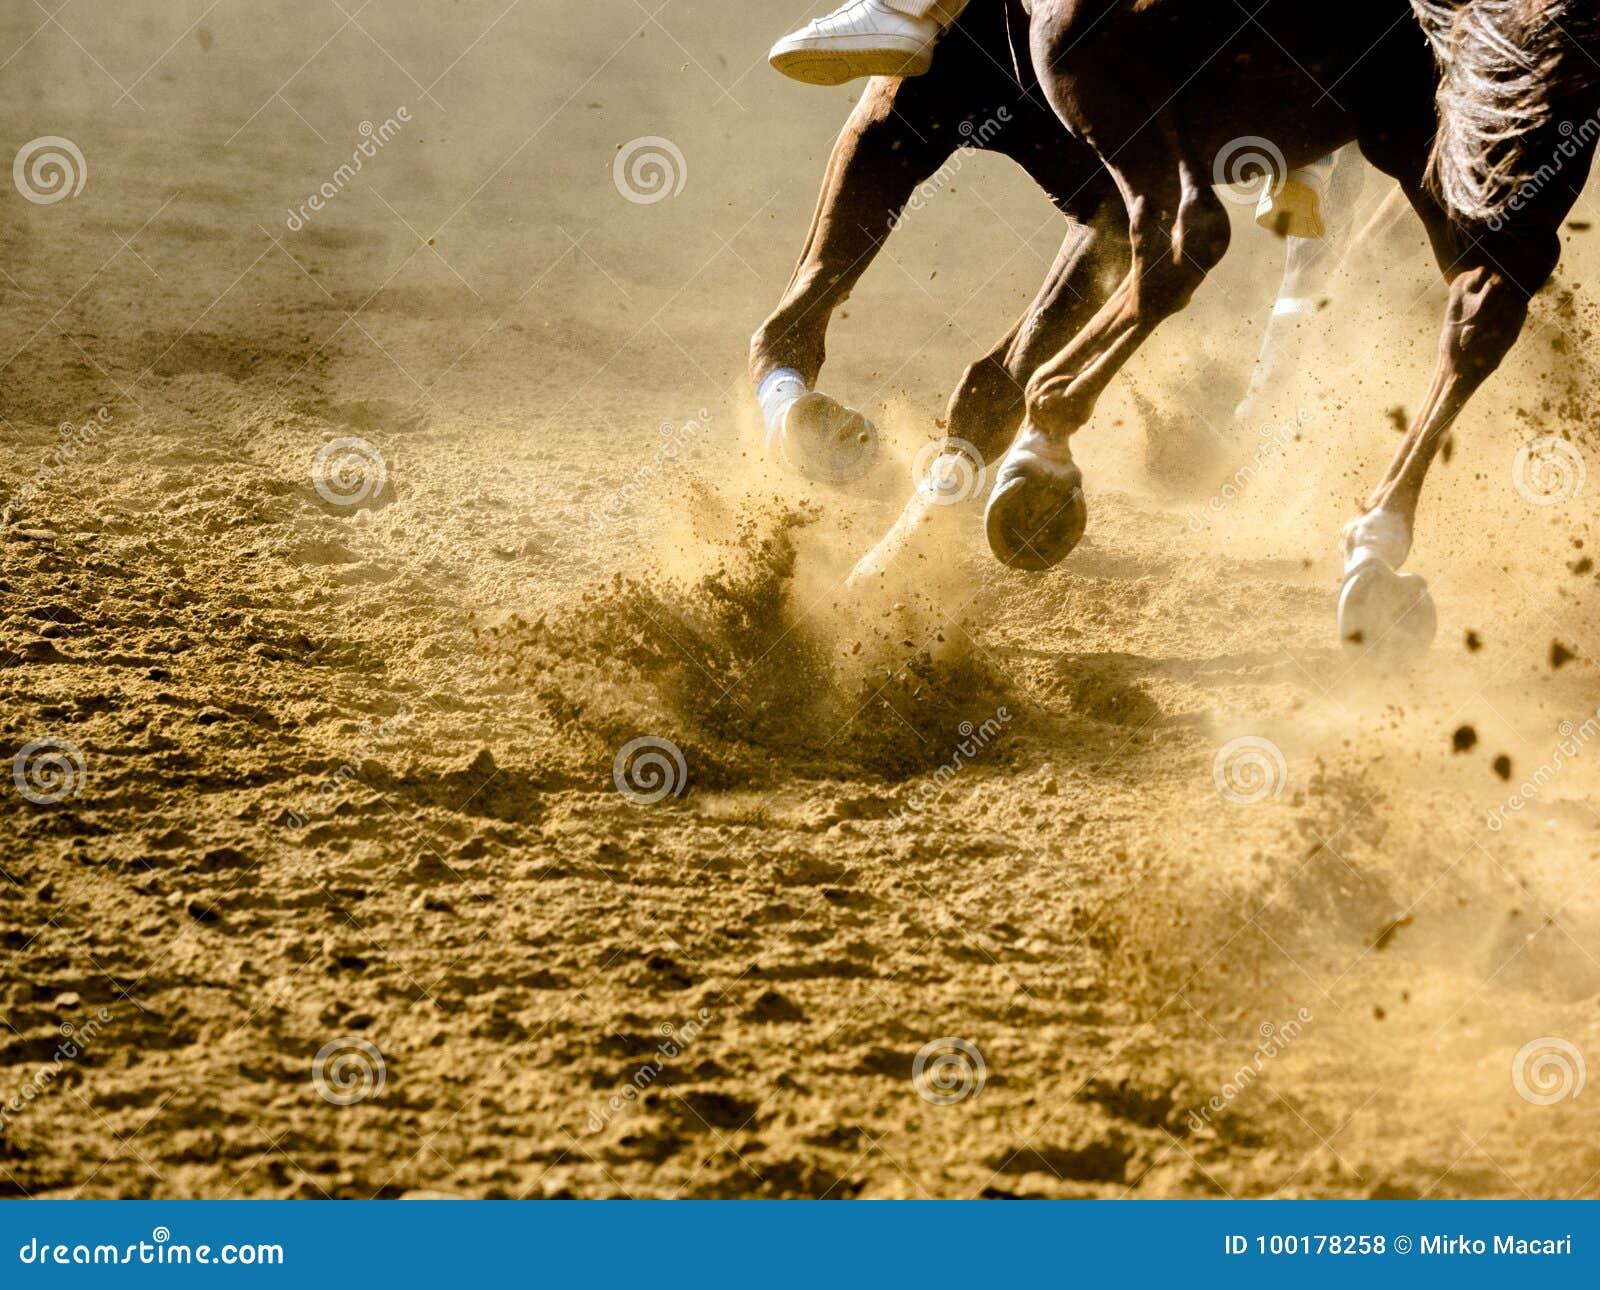 Palio di Asti horse racing details of galloping horses legs on hippodrome